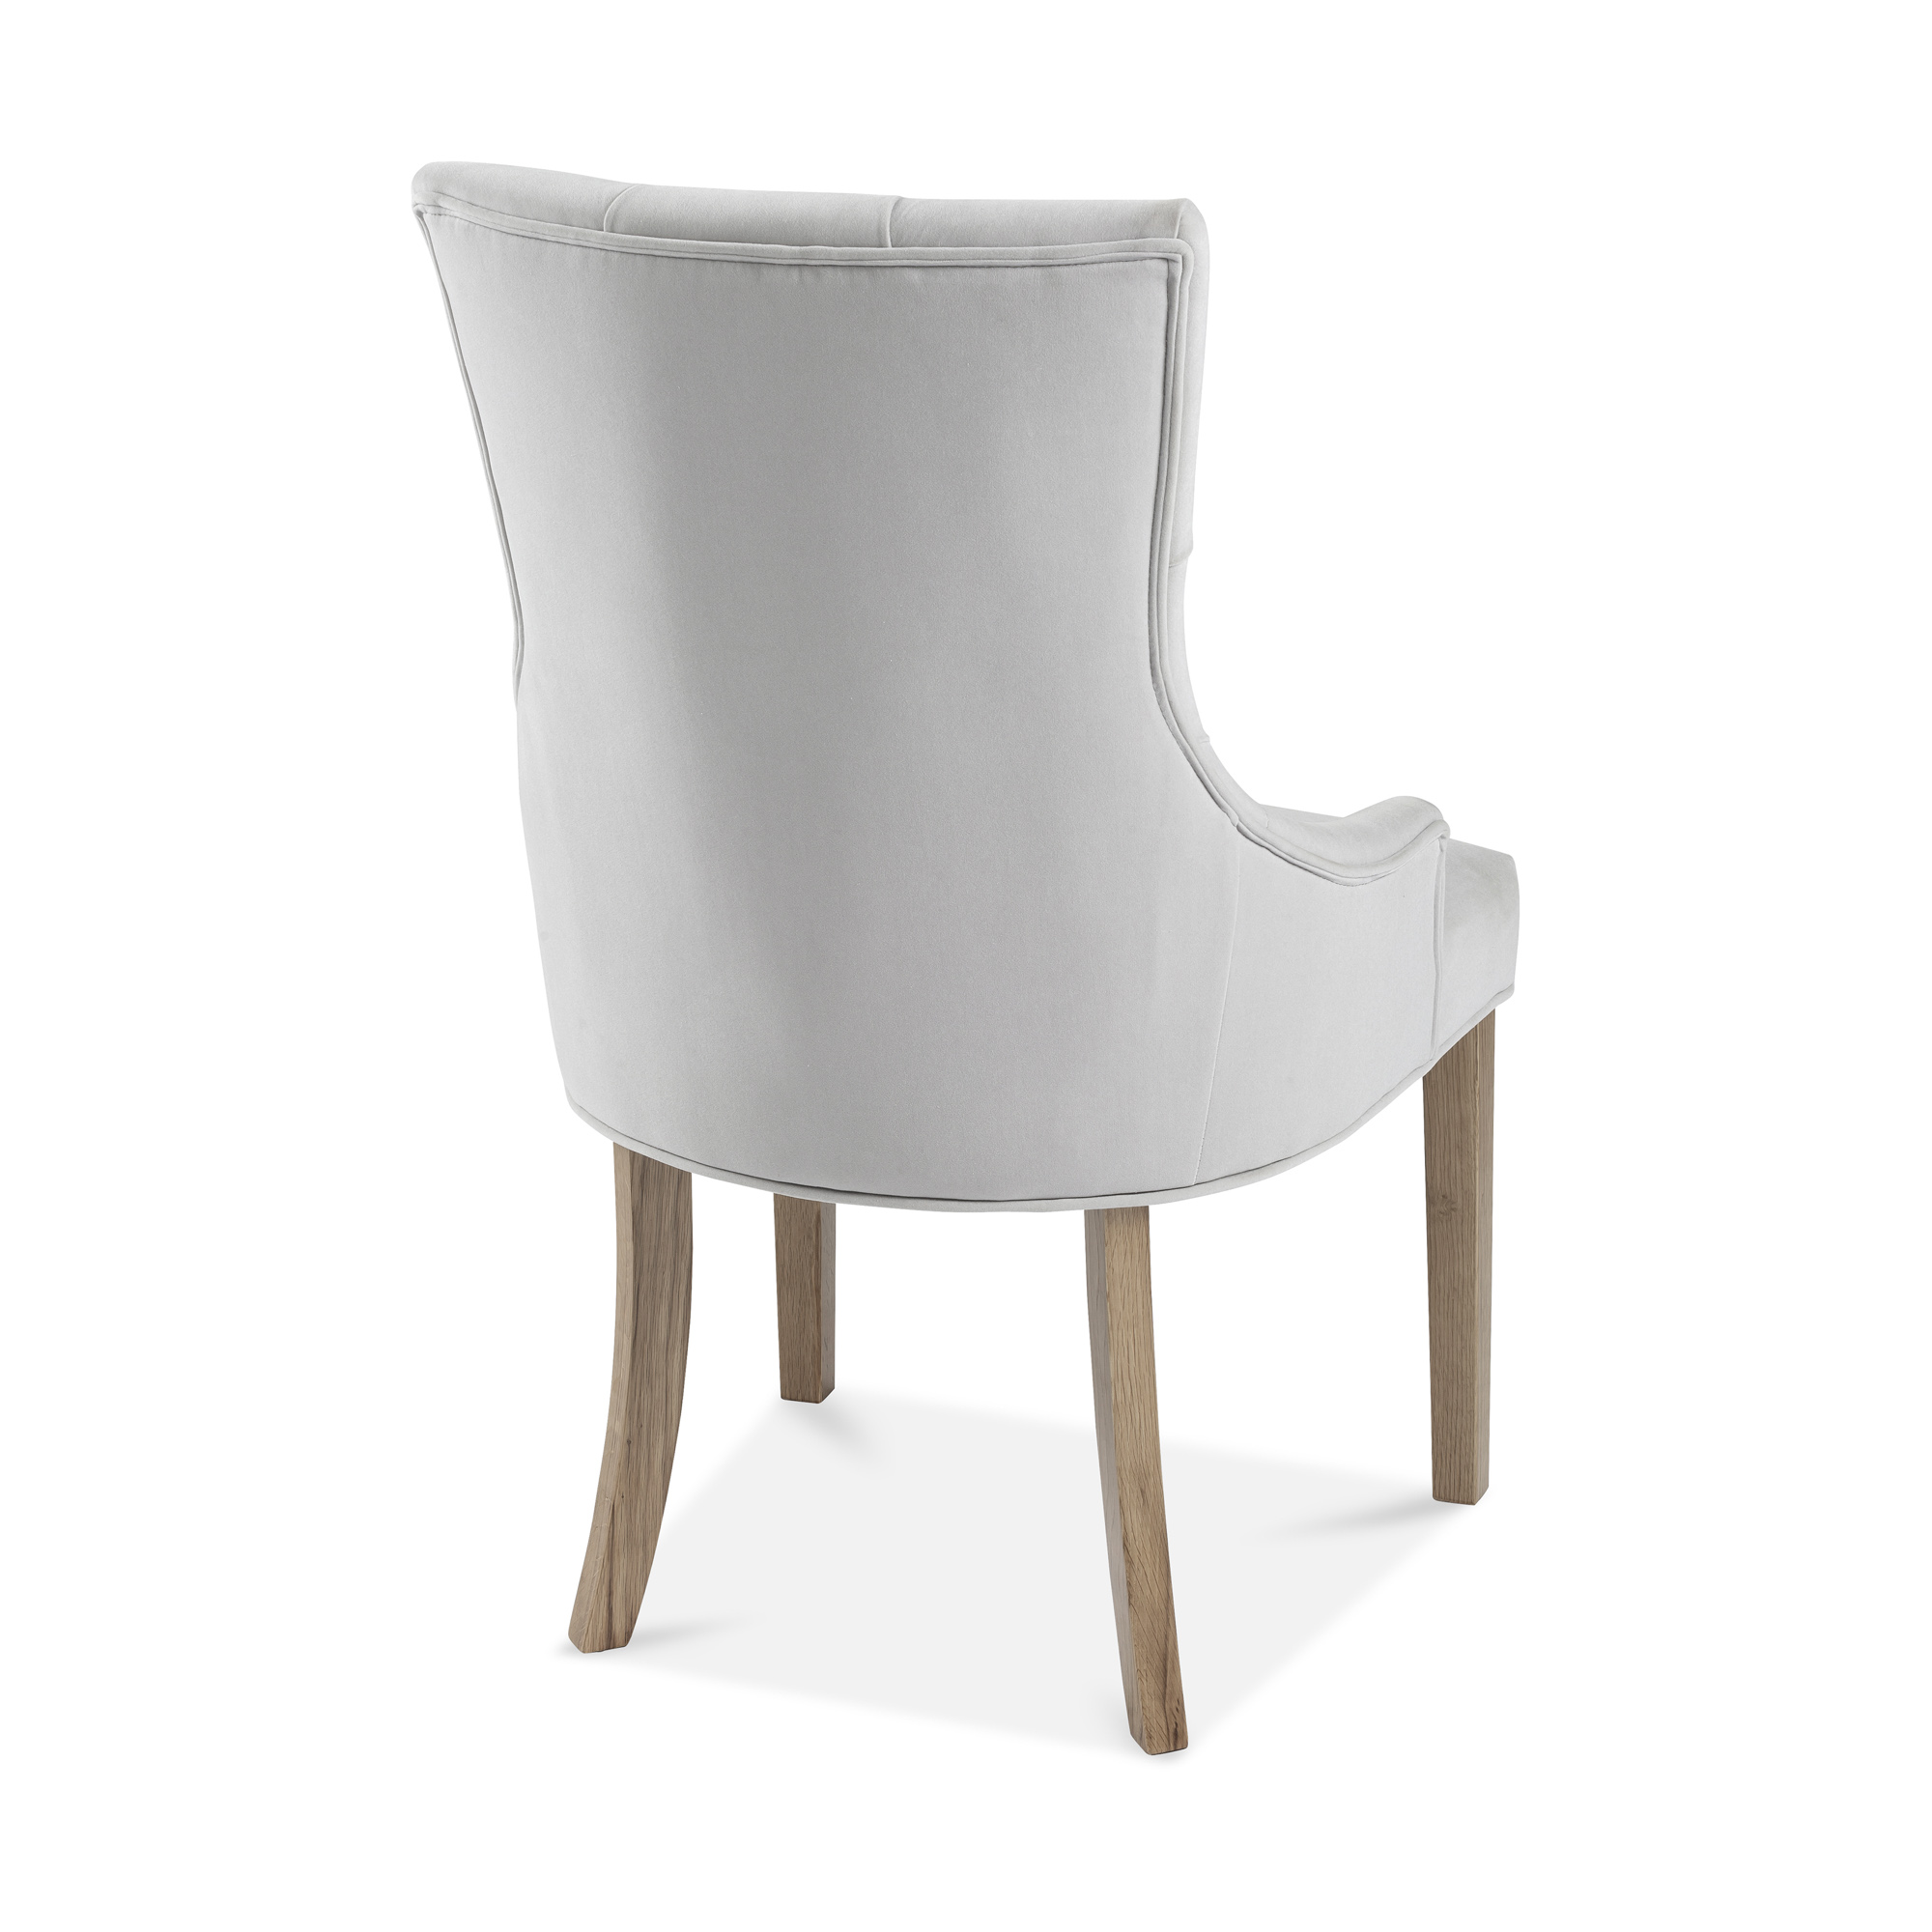 Truro Brushed Velvet Upholstered Scoop Dining Chair – Dove Grey